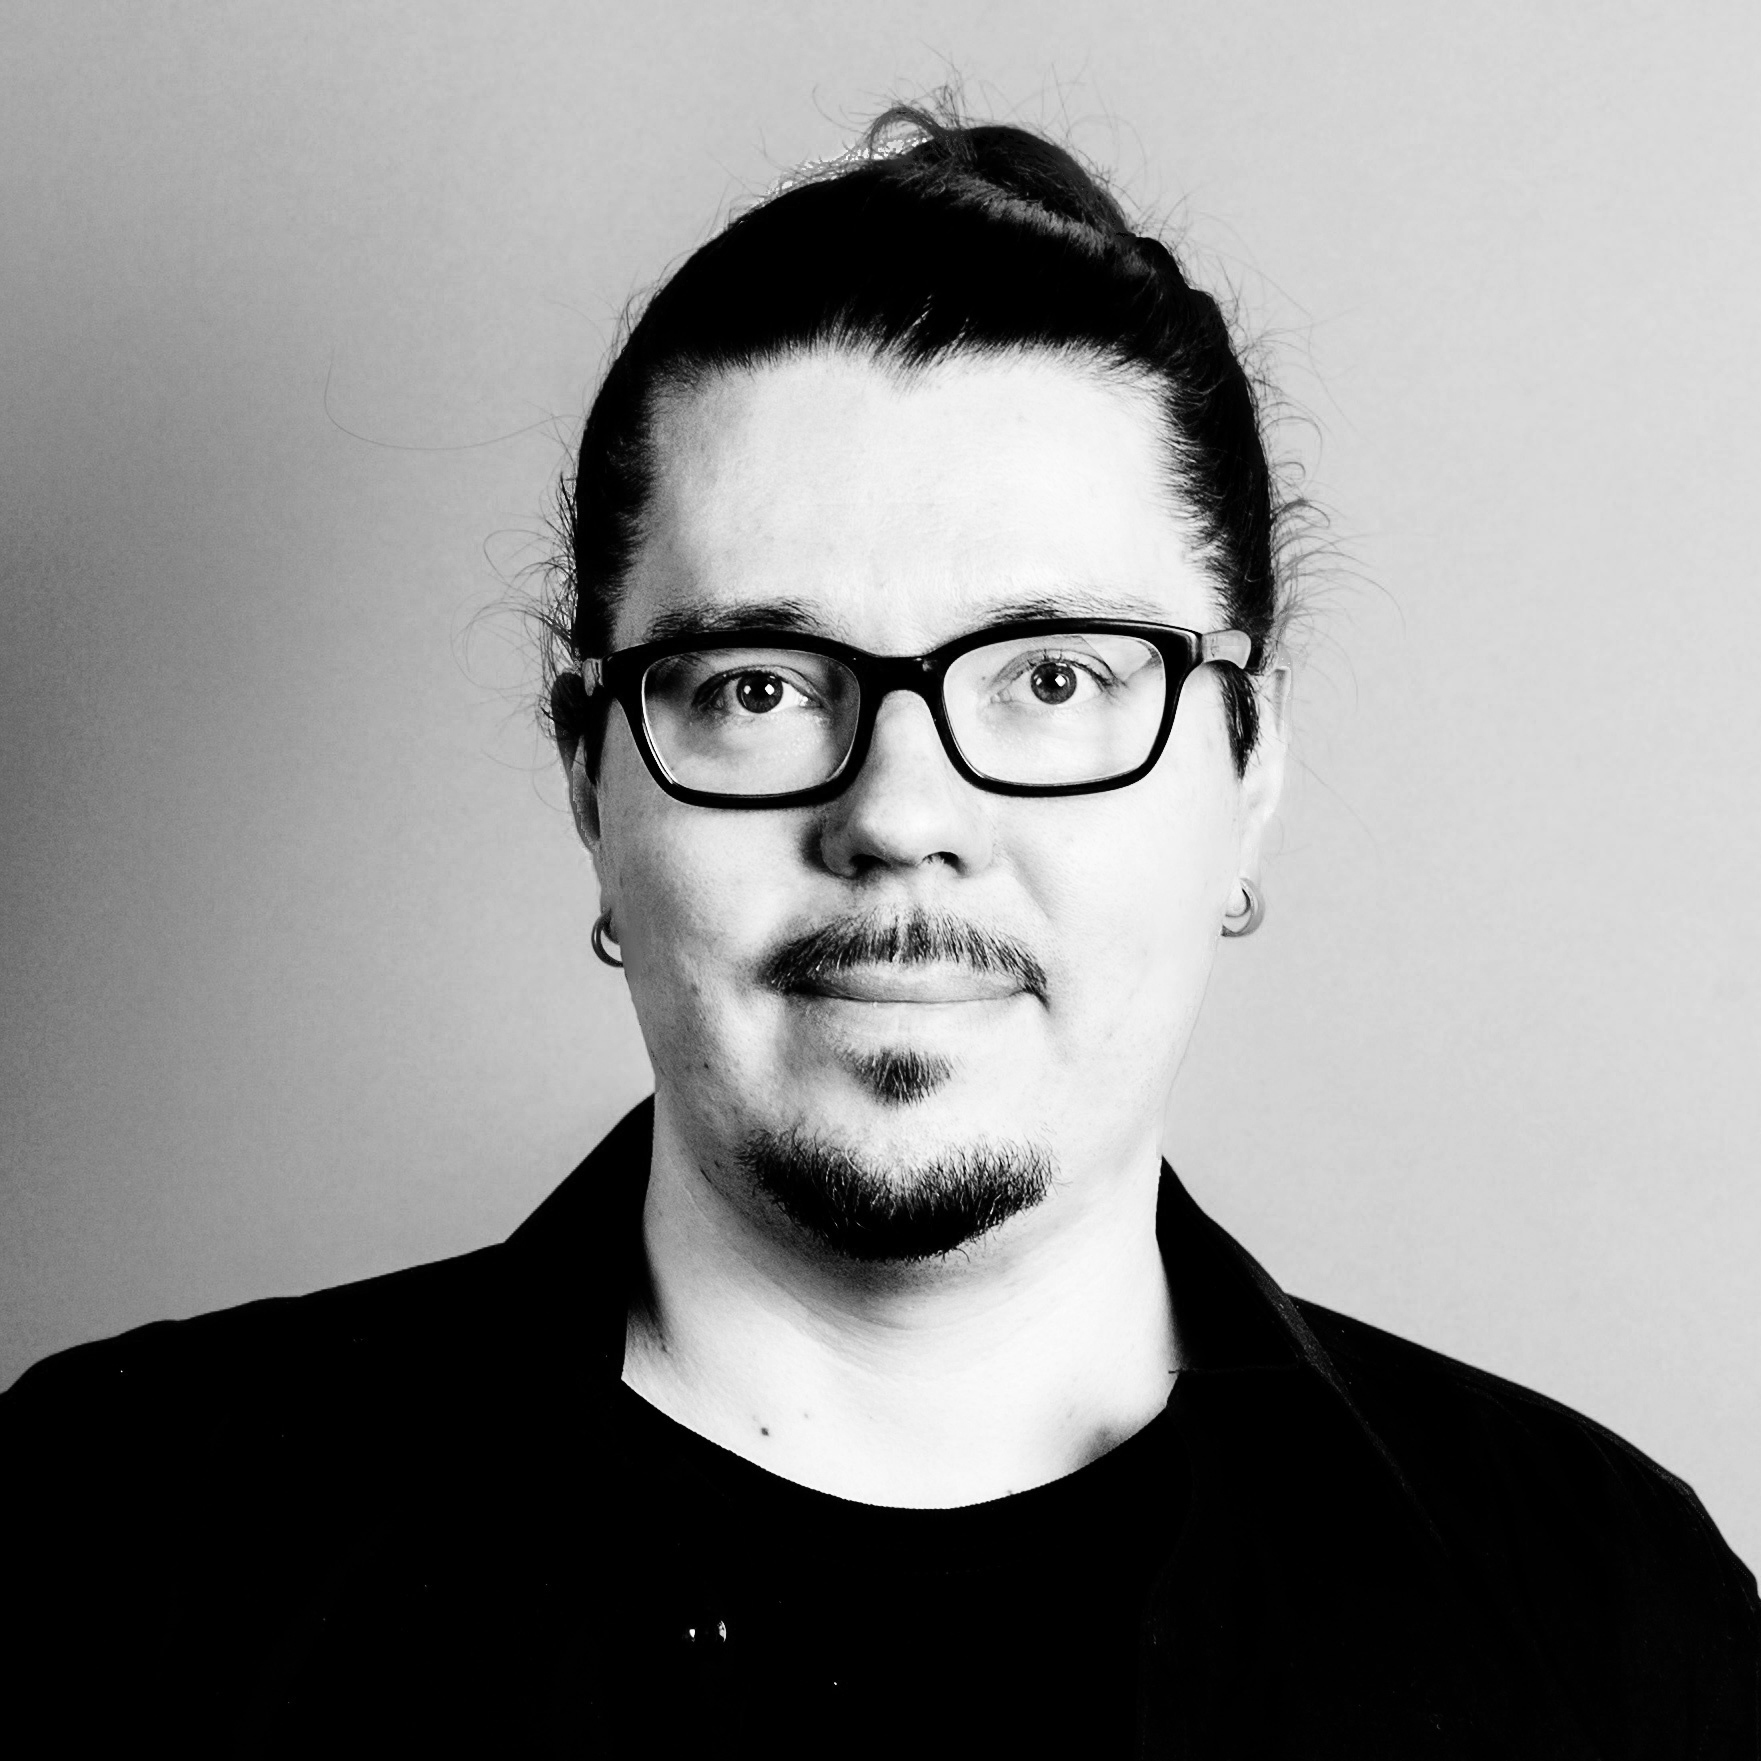 Image showing Niku Hietanen